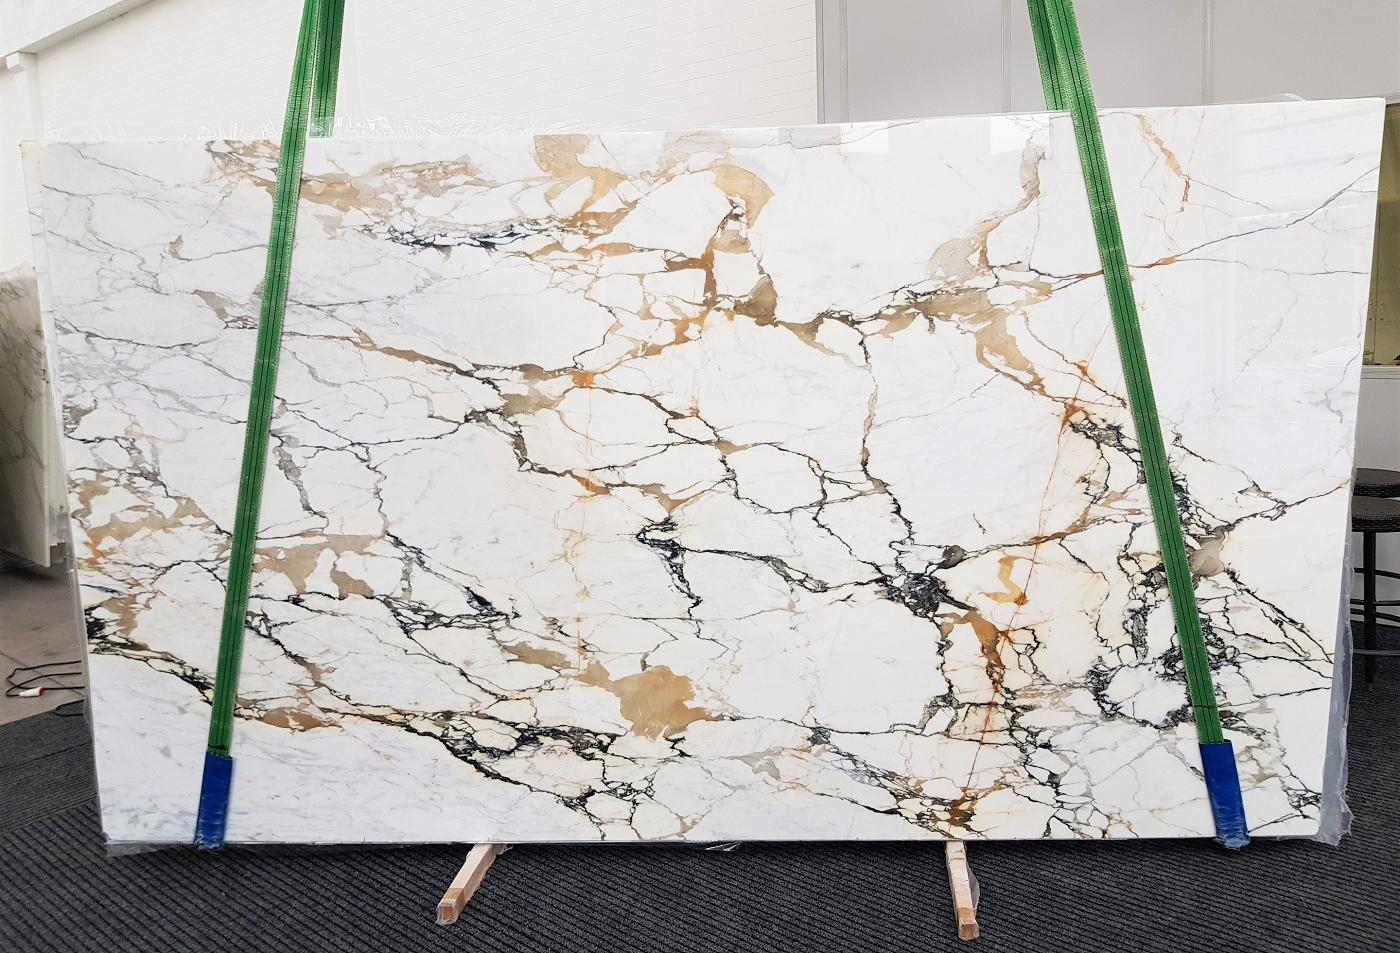 CALACATTA MACCHIAVECCHIA Suministro Verona (Italia) de planchas pulidas en mármol natural GL 1131 , Bundle #5